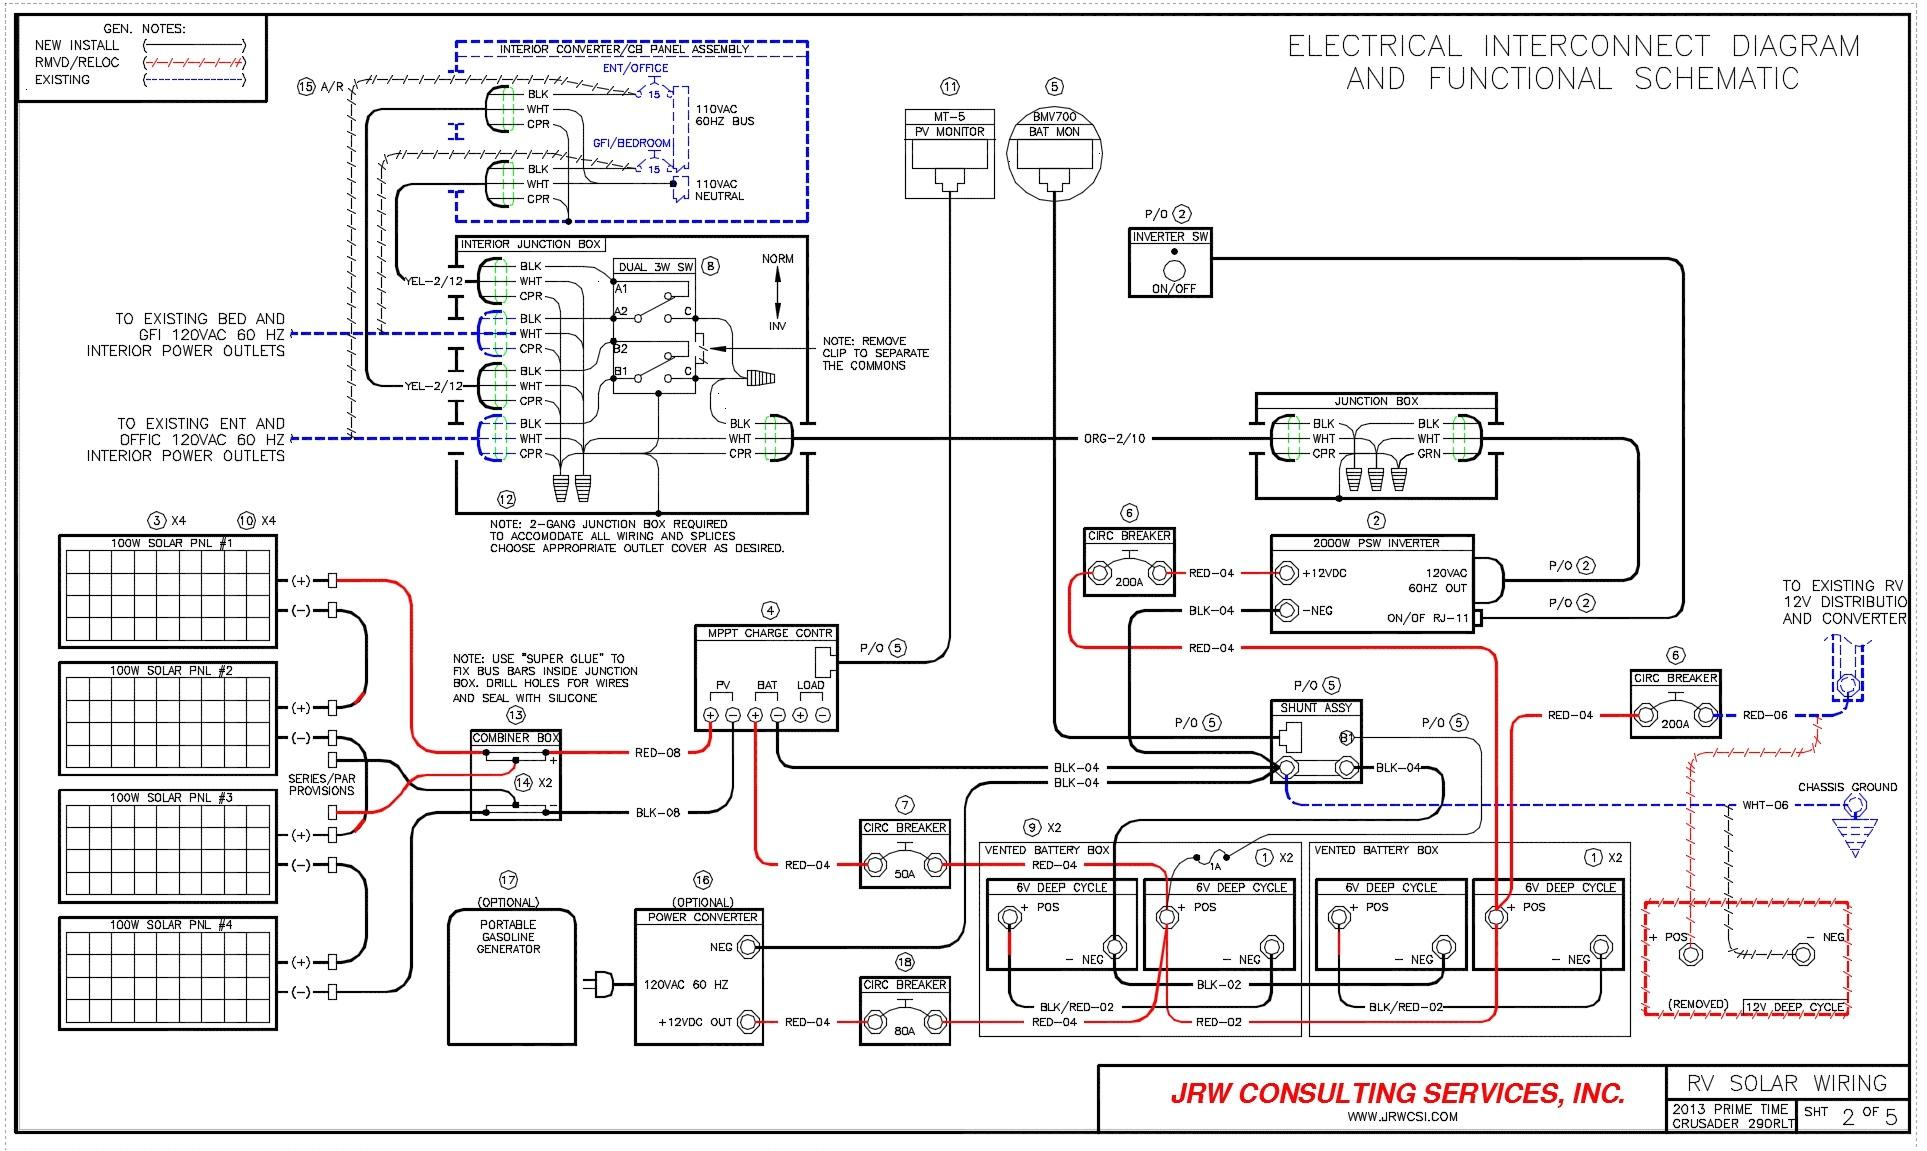 2005 fleetwood rv wiring diagram wiring diagram filter 2005 fleetwood wiring diagram wiring diagram priv 2005